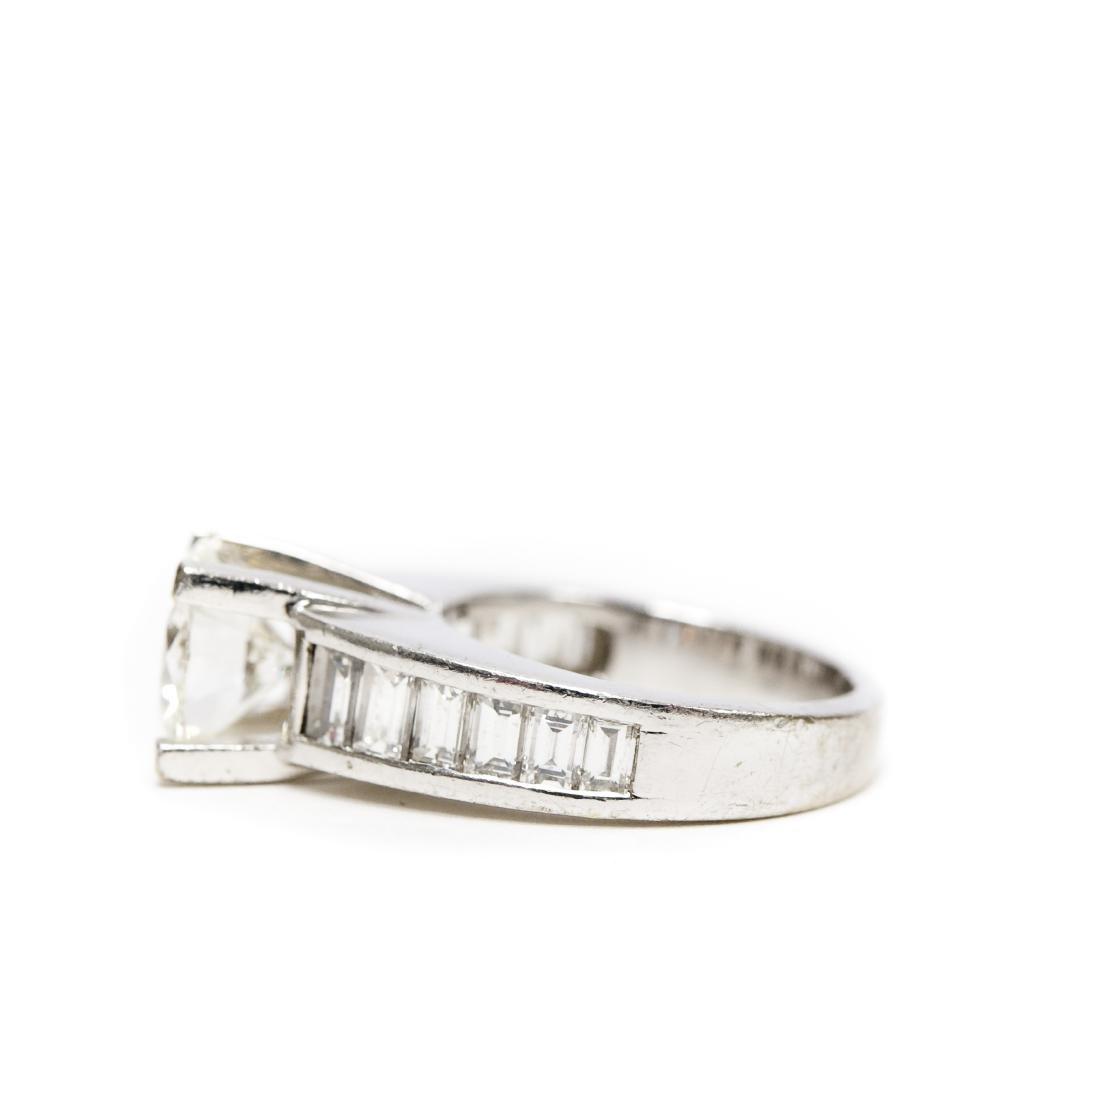 18K White Gold & Diamond Ring. 2.17 ct Center Diamond. - 6